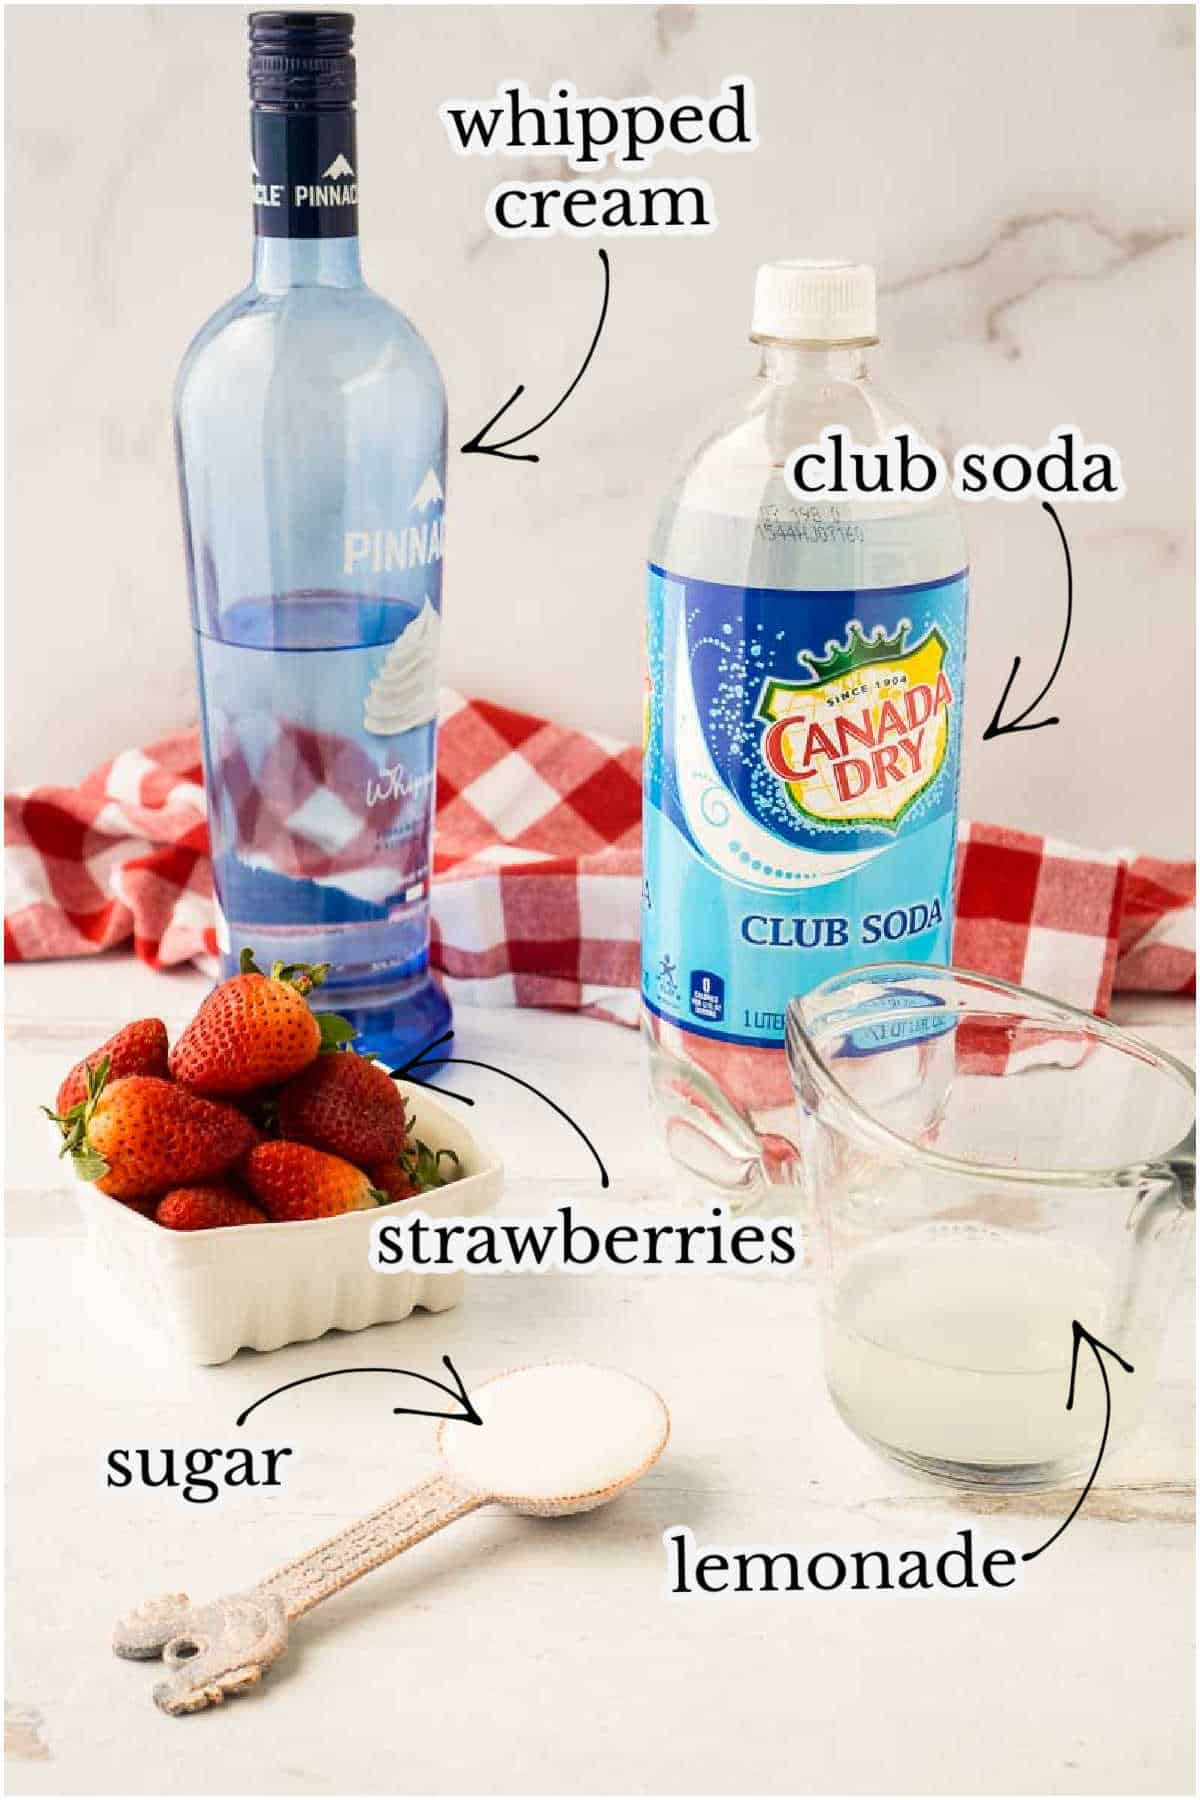 whipped cream vodka, club soda, strawberries, and lemonade on white counter